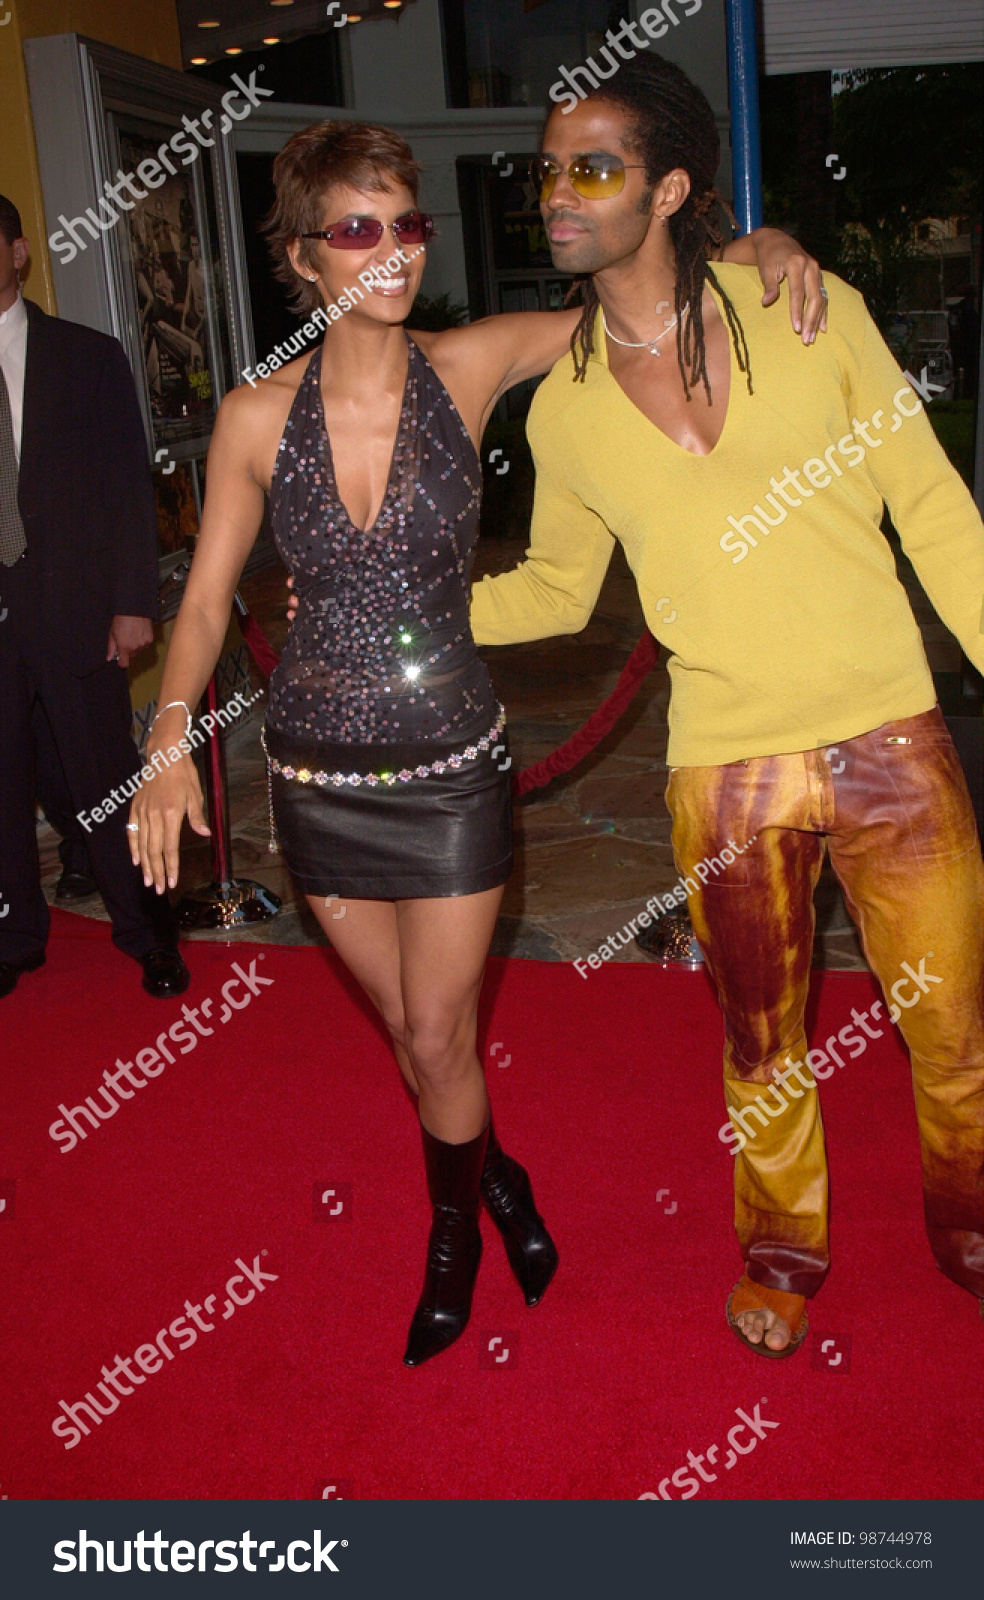 Emily Blunt (born 1983 (naturalized American citizen),Billie Jean King 12 Grand Slam singles titles Adult pictures Morakot Kittisara,Nancy Price